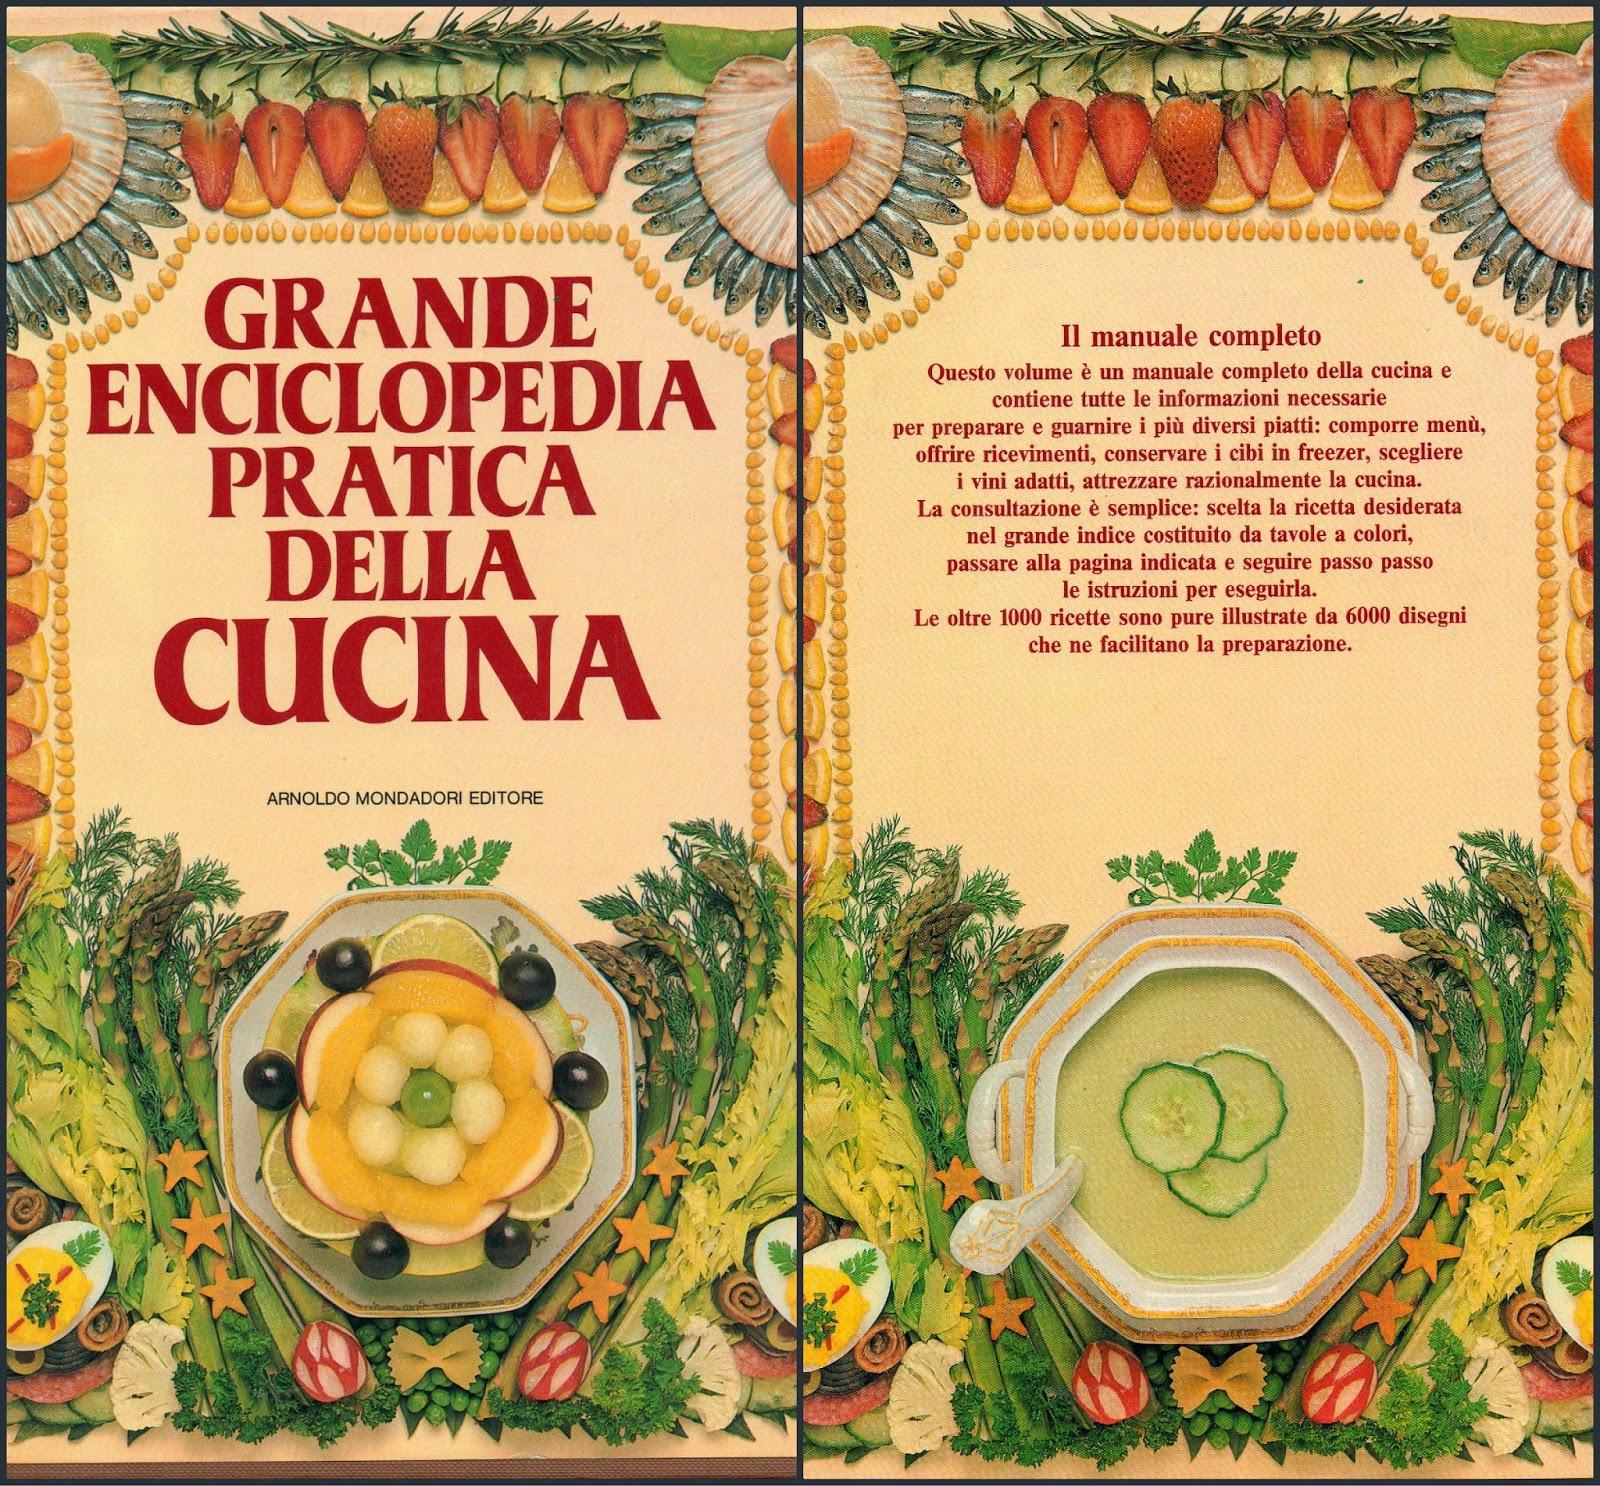 Ricetta crepes tradotta in francese